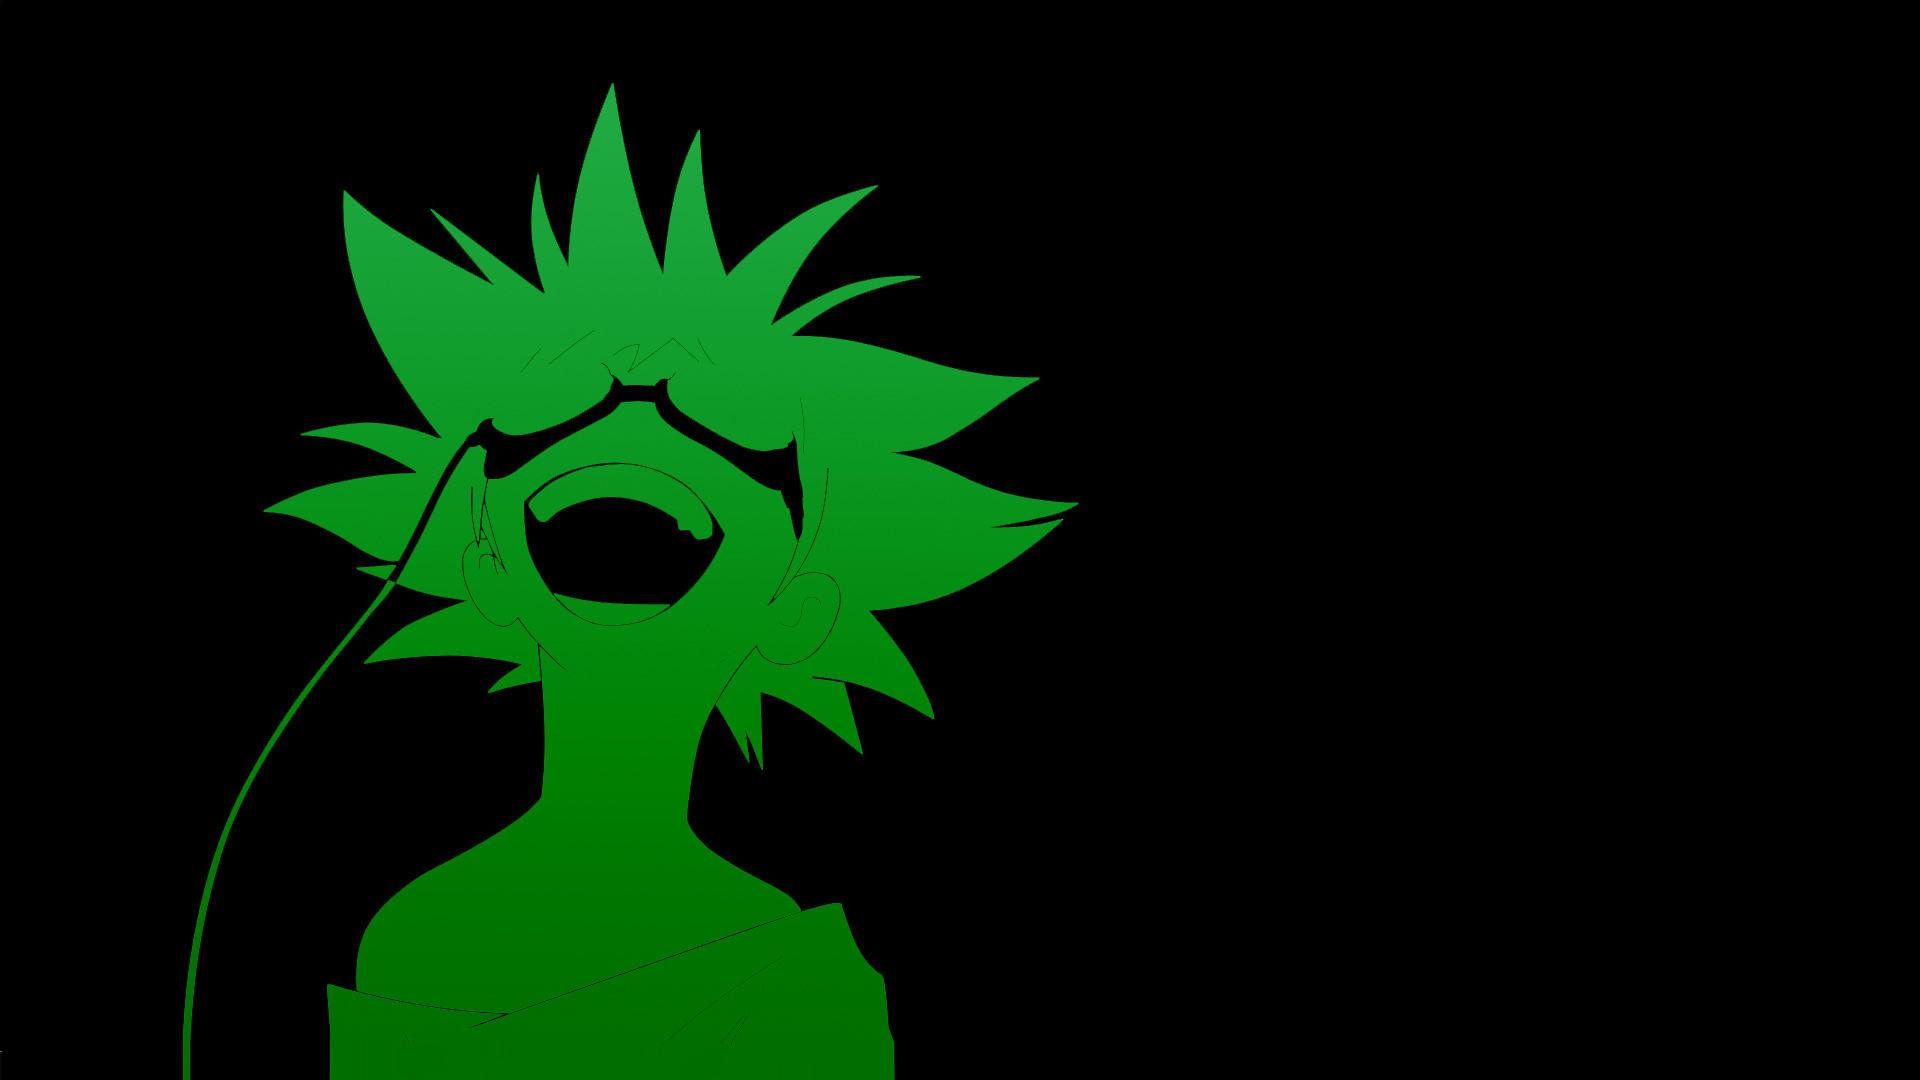 Anime Cowboy Bebop anime green black background anime boys